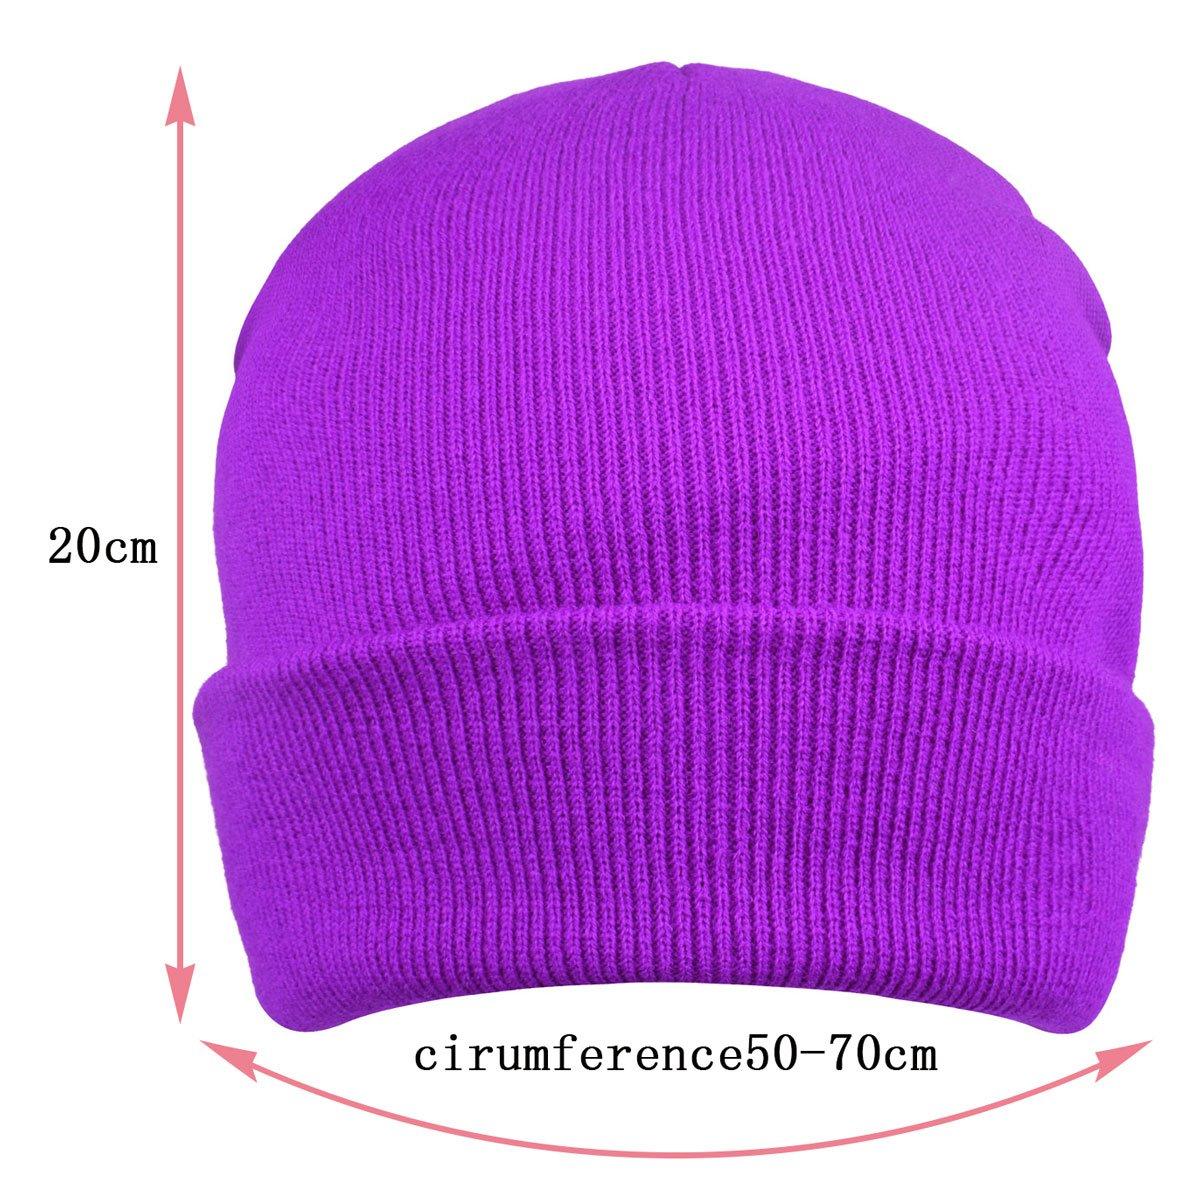 ae0f1698c27 Amazon.com  Unisex Cuffed Knit Skull Beanie toboggan Knit Hats and Caps ( Violet)  Clothing